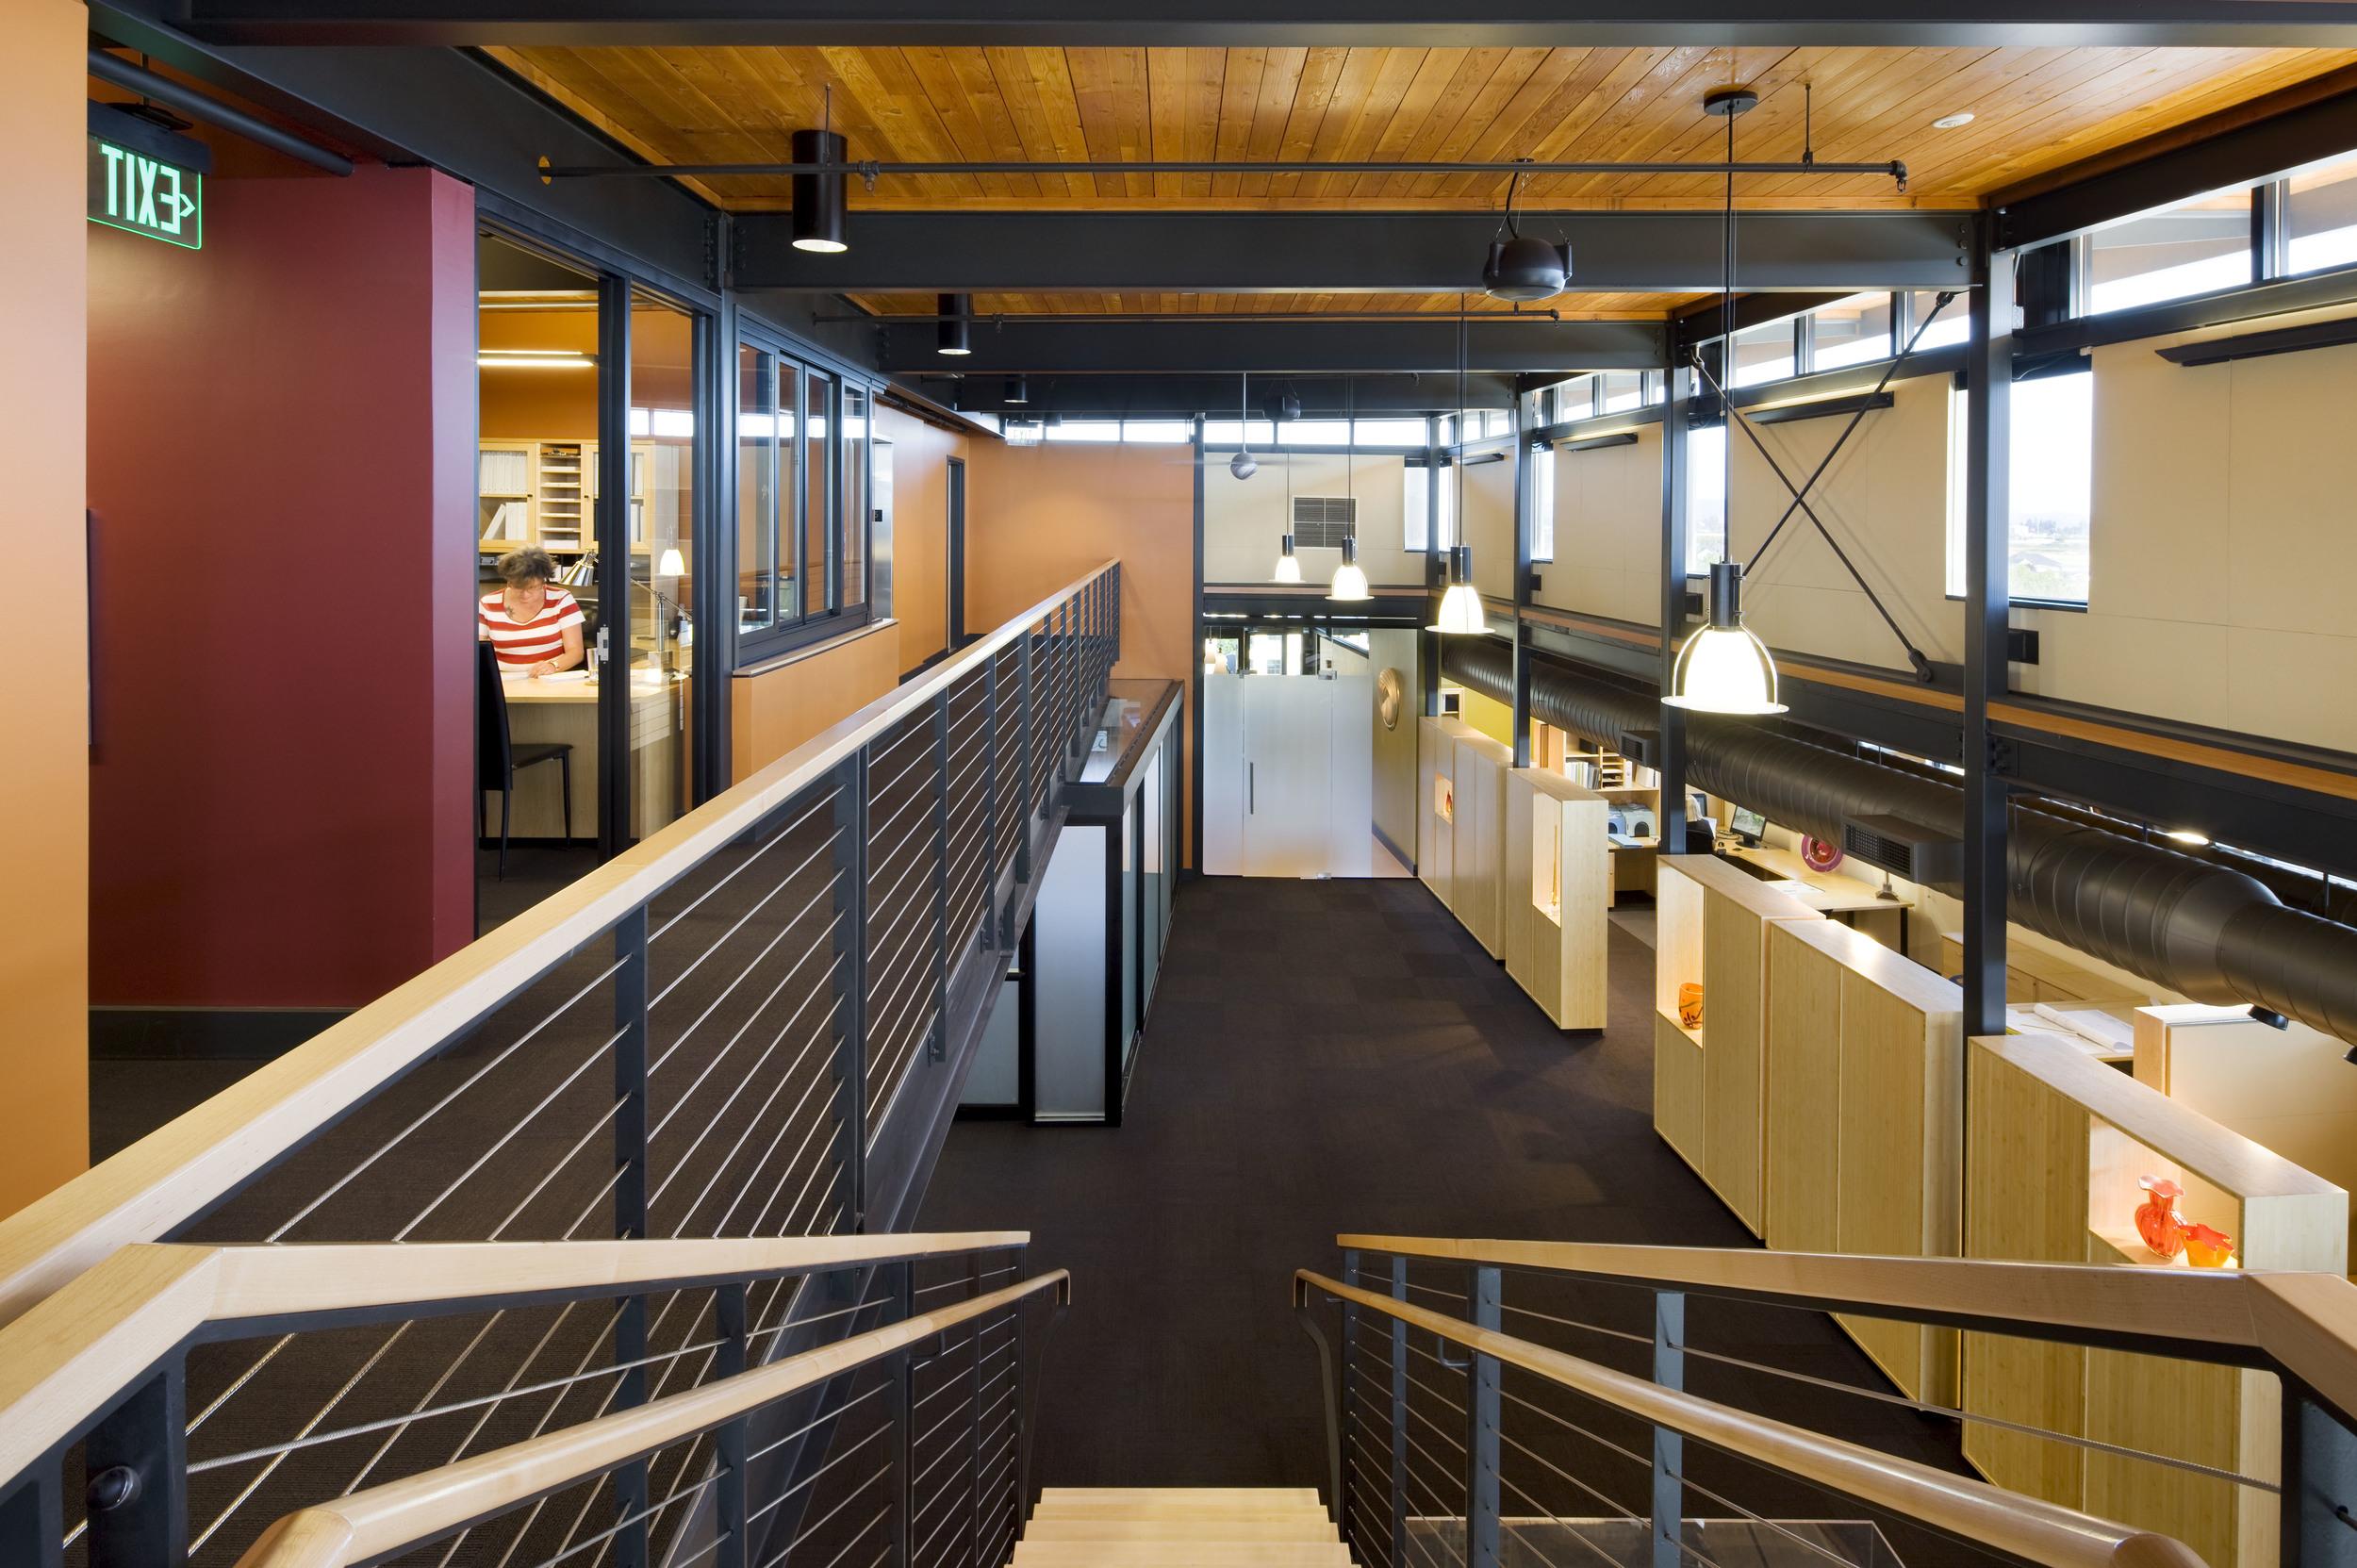 609-5_03_Arlie_Offices_main_room3.jpg